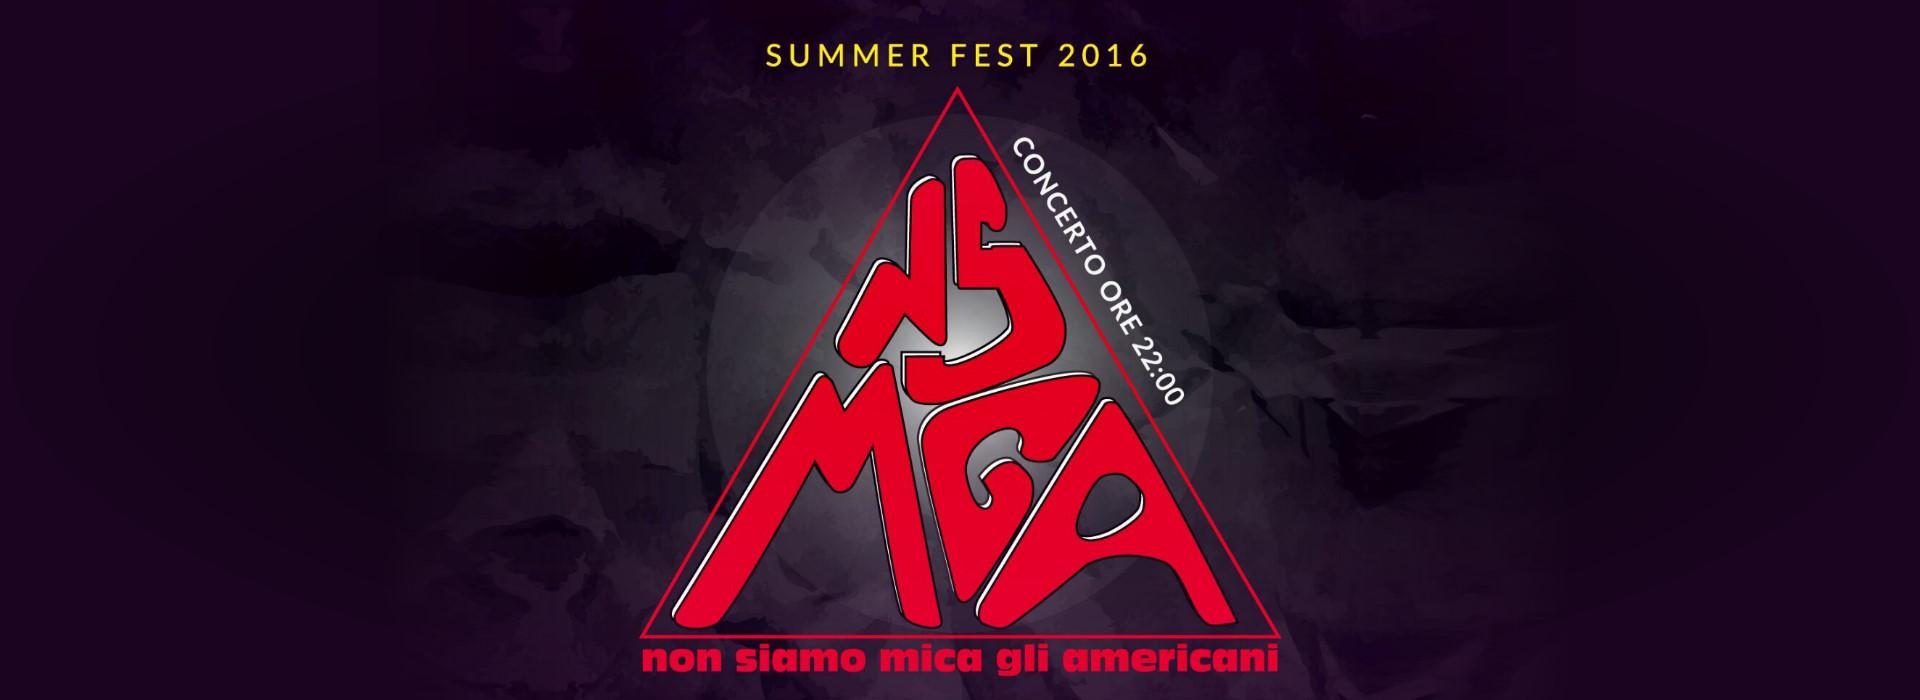 Summer Fest 2016 – NSMGA